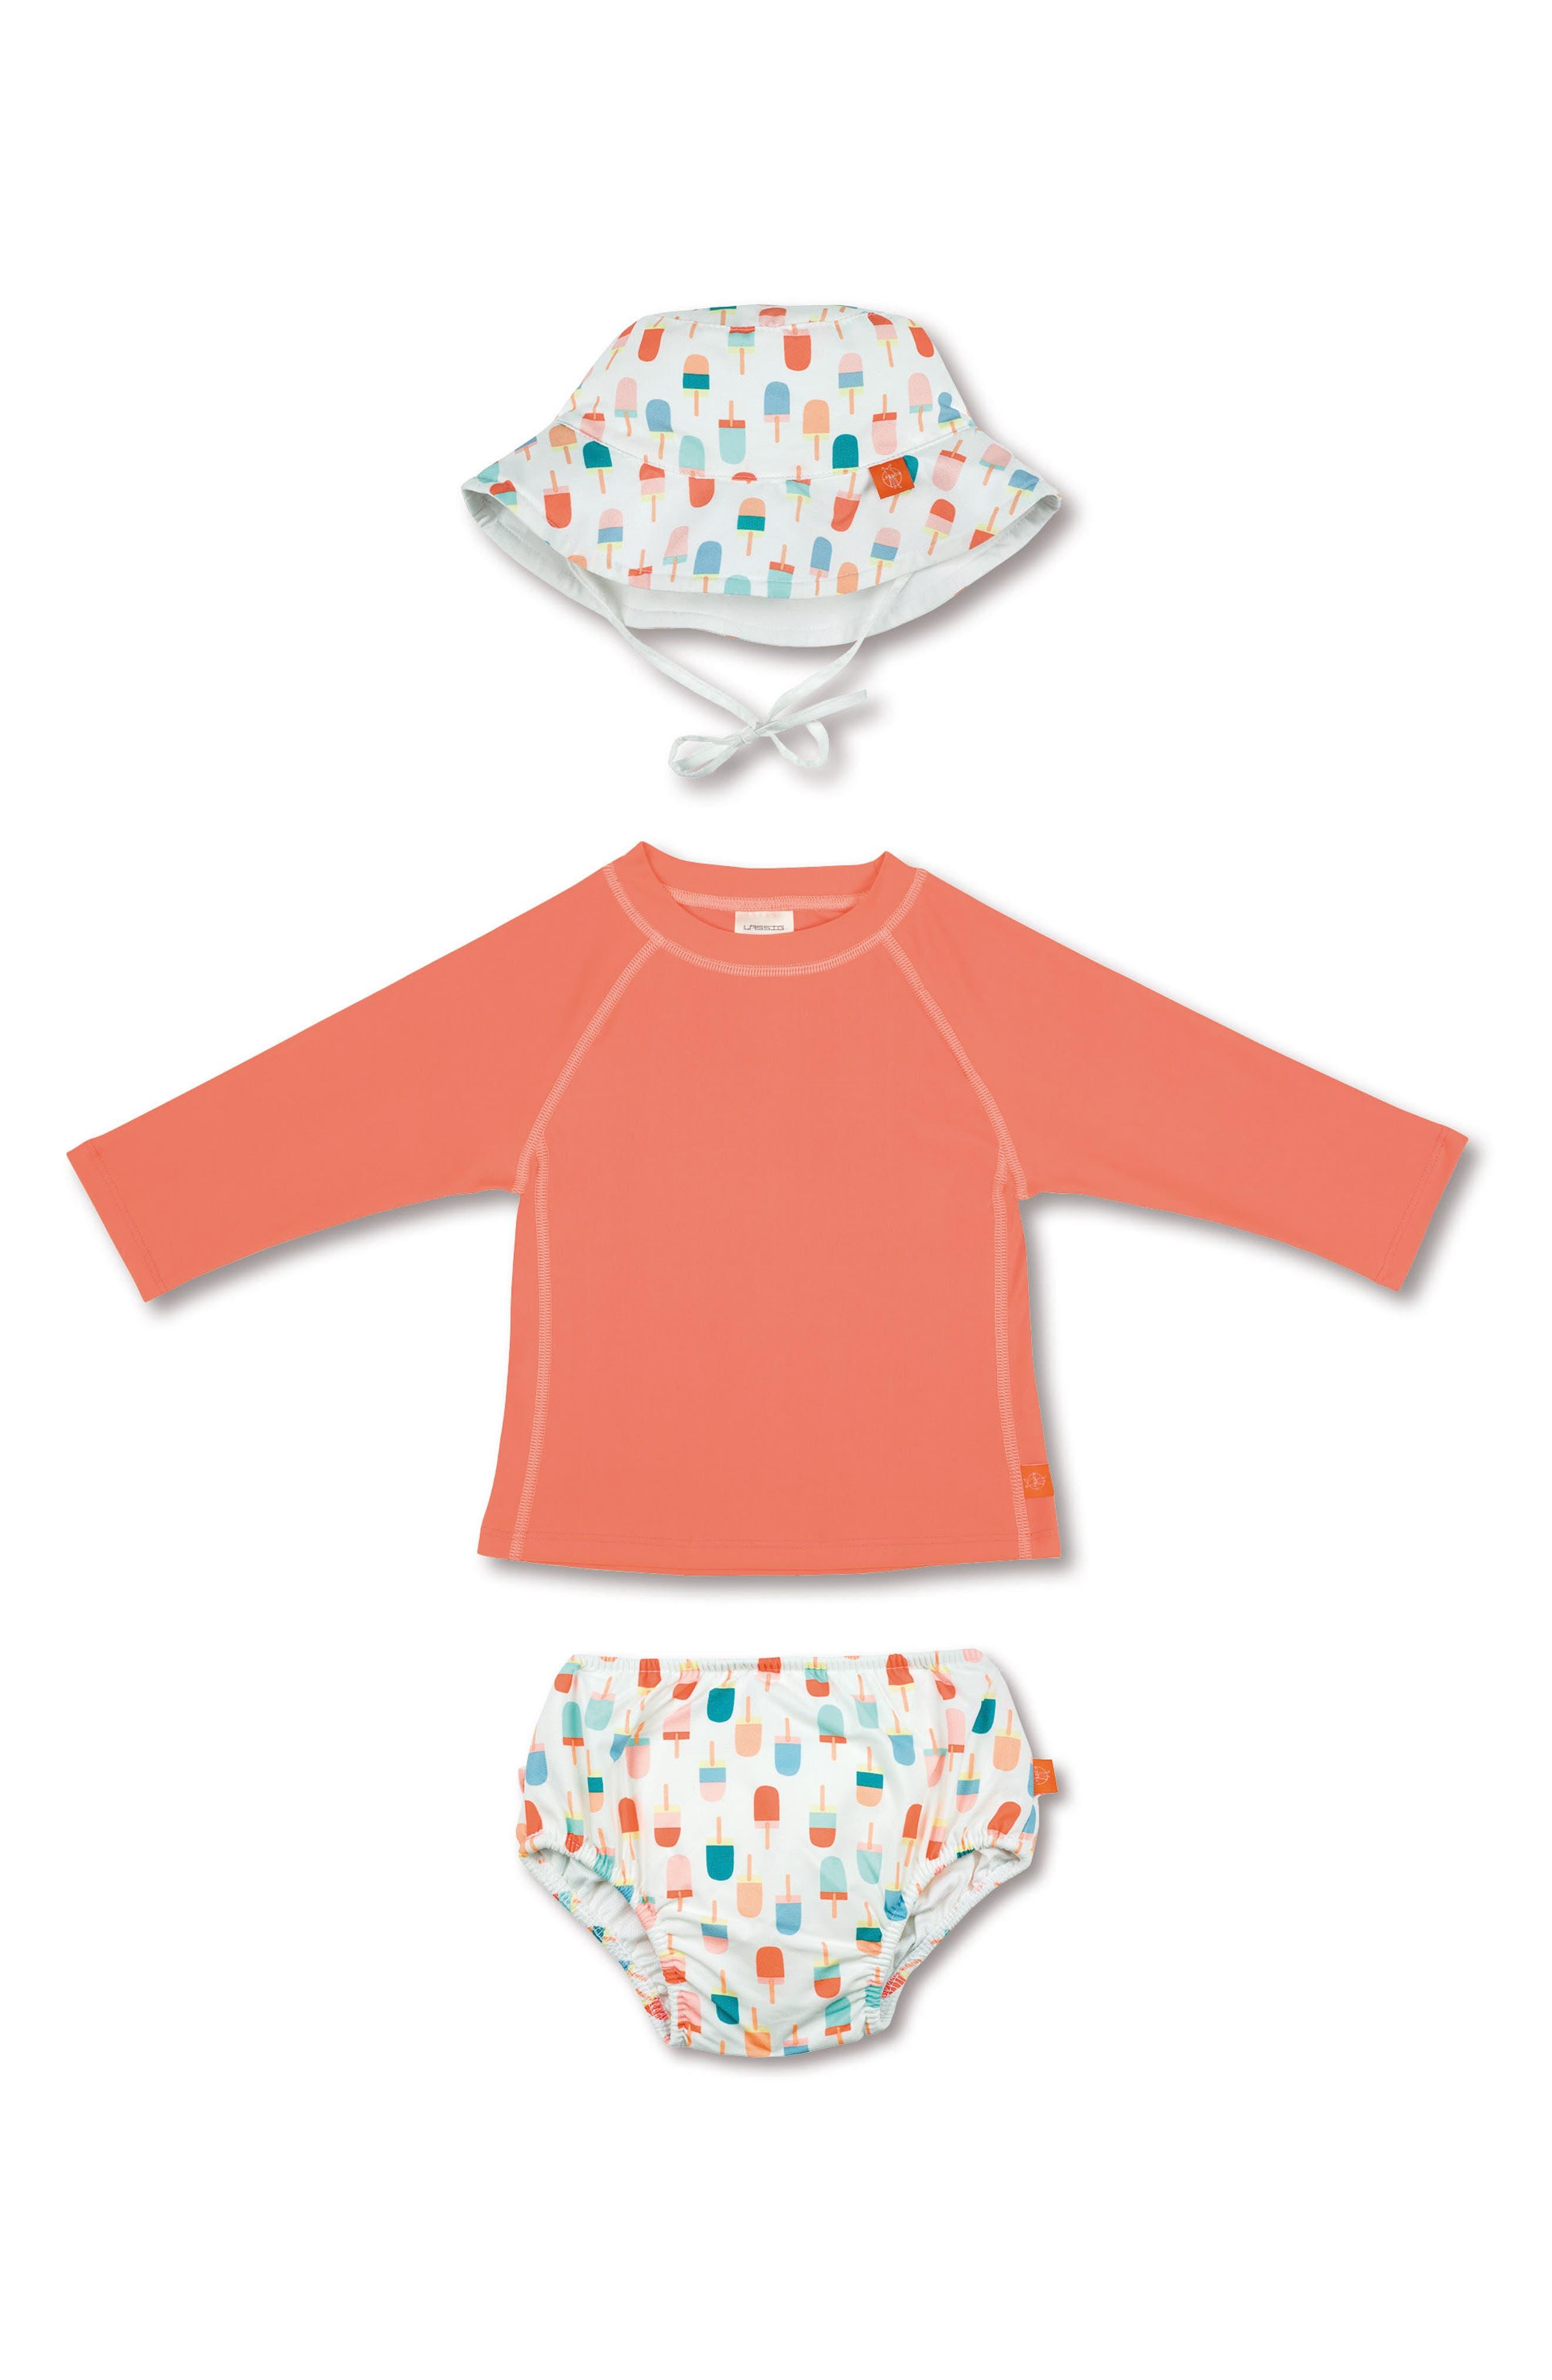 Main Image - Lassig Two-Piece Rashguard Swimsuit & Hat Set (Baby Girls & Toddler Girls)